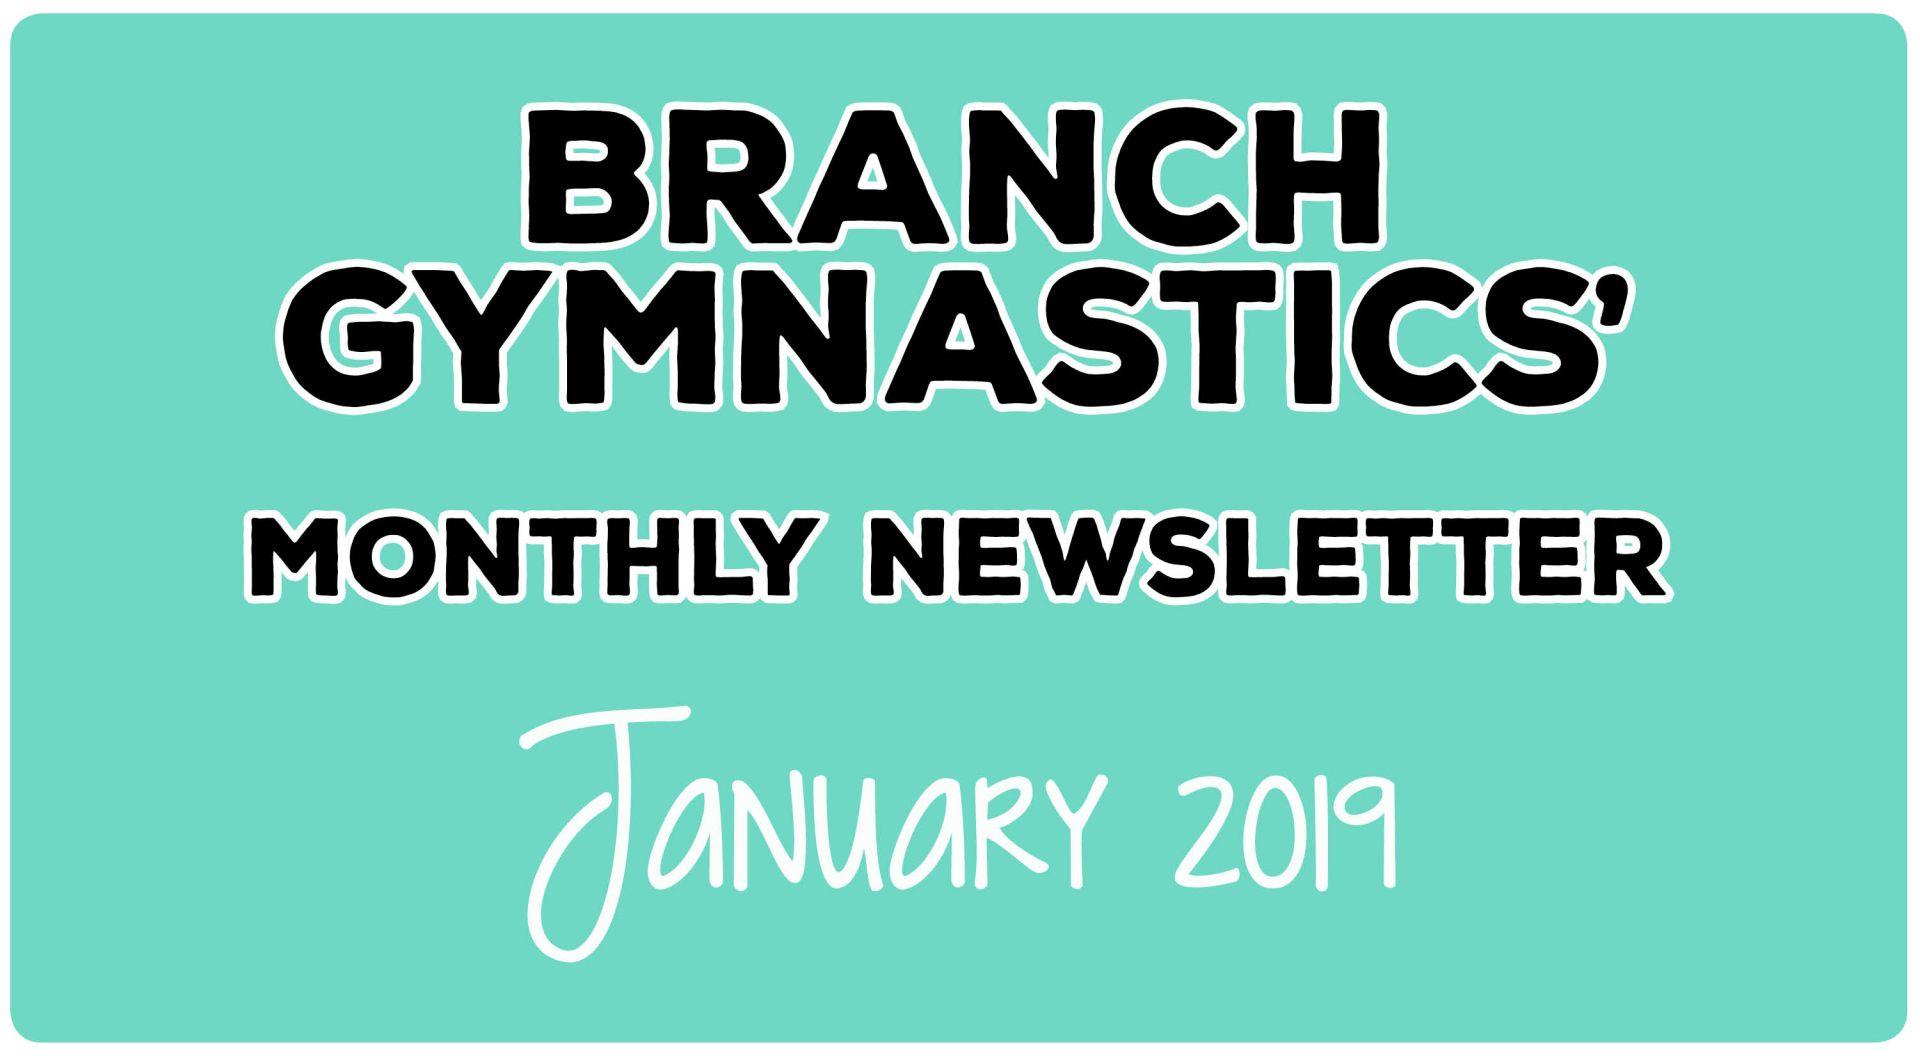 Branch Gymnastics' January Newsletter